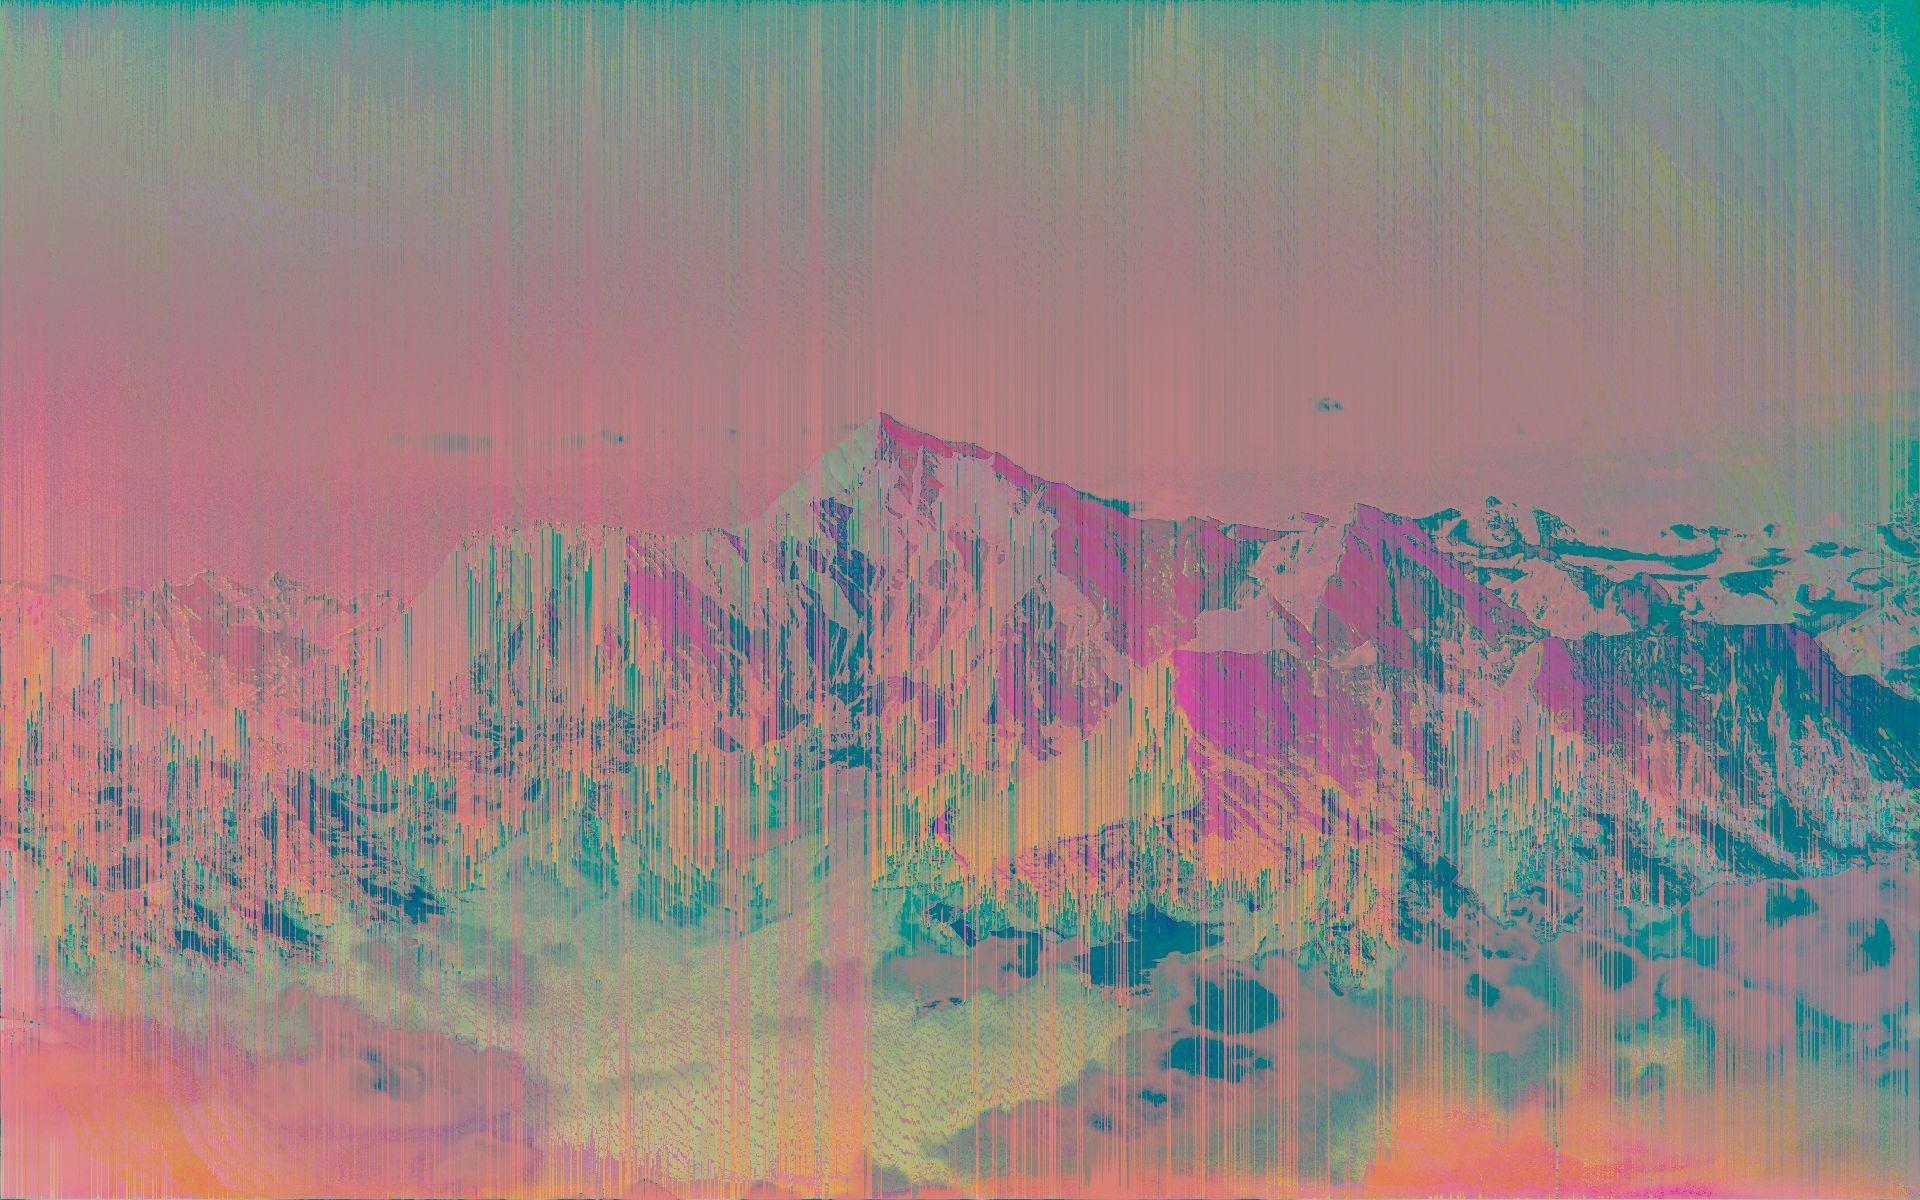 Vaporwave HD Wallpaper   1920x1080   ID:56013   Vaporwave ...